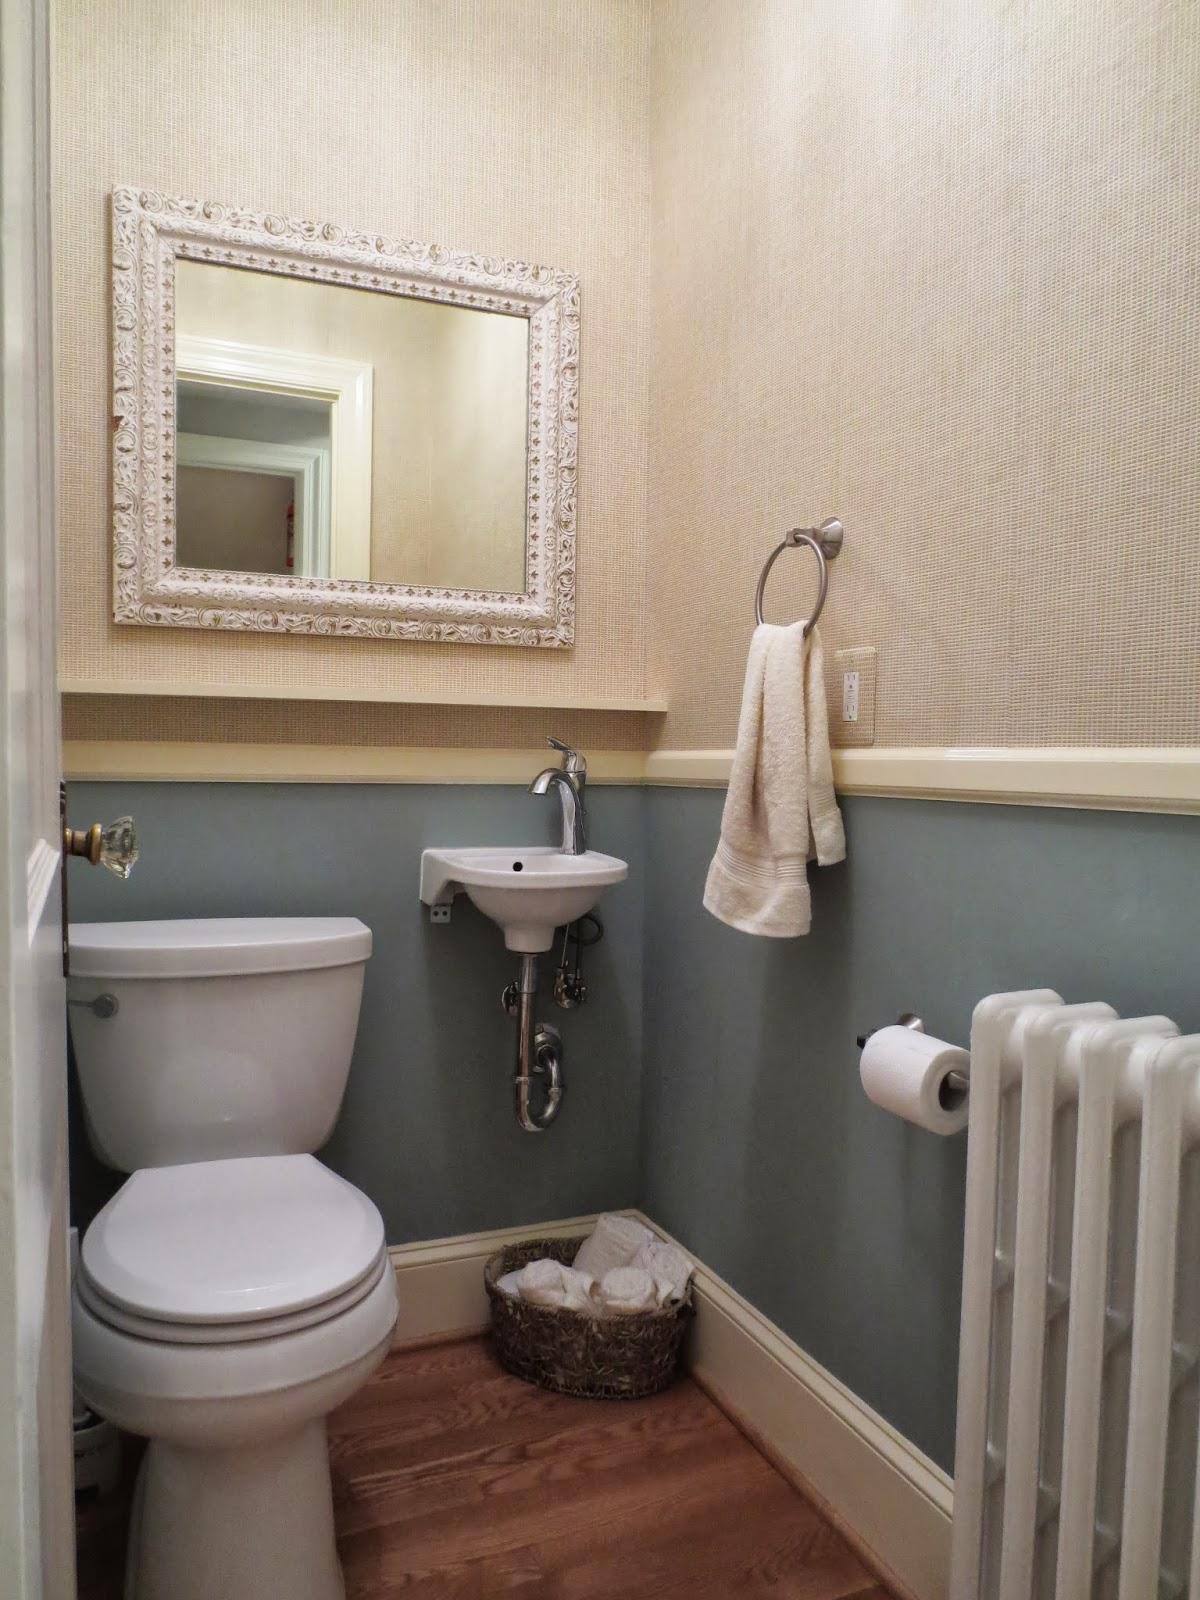 Bathroom chair rail ideas bathroom design ideas for Chair rail ideas for bathroom